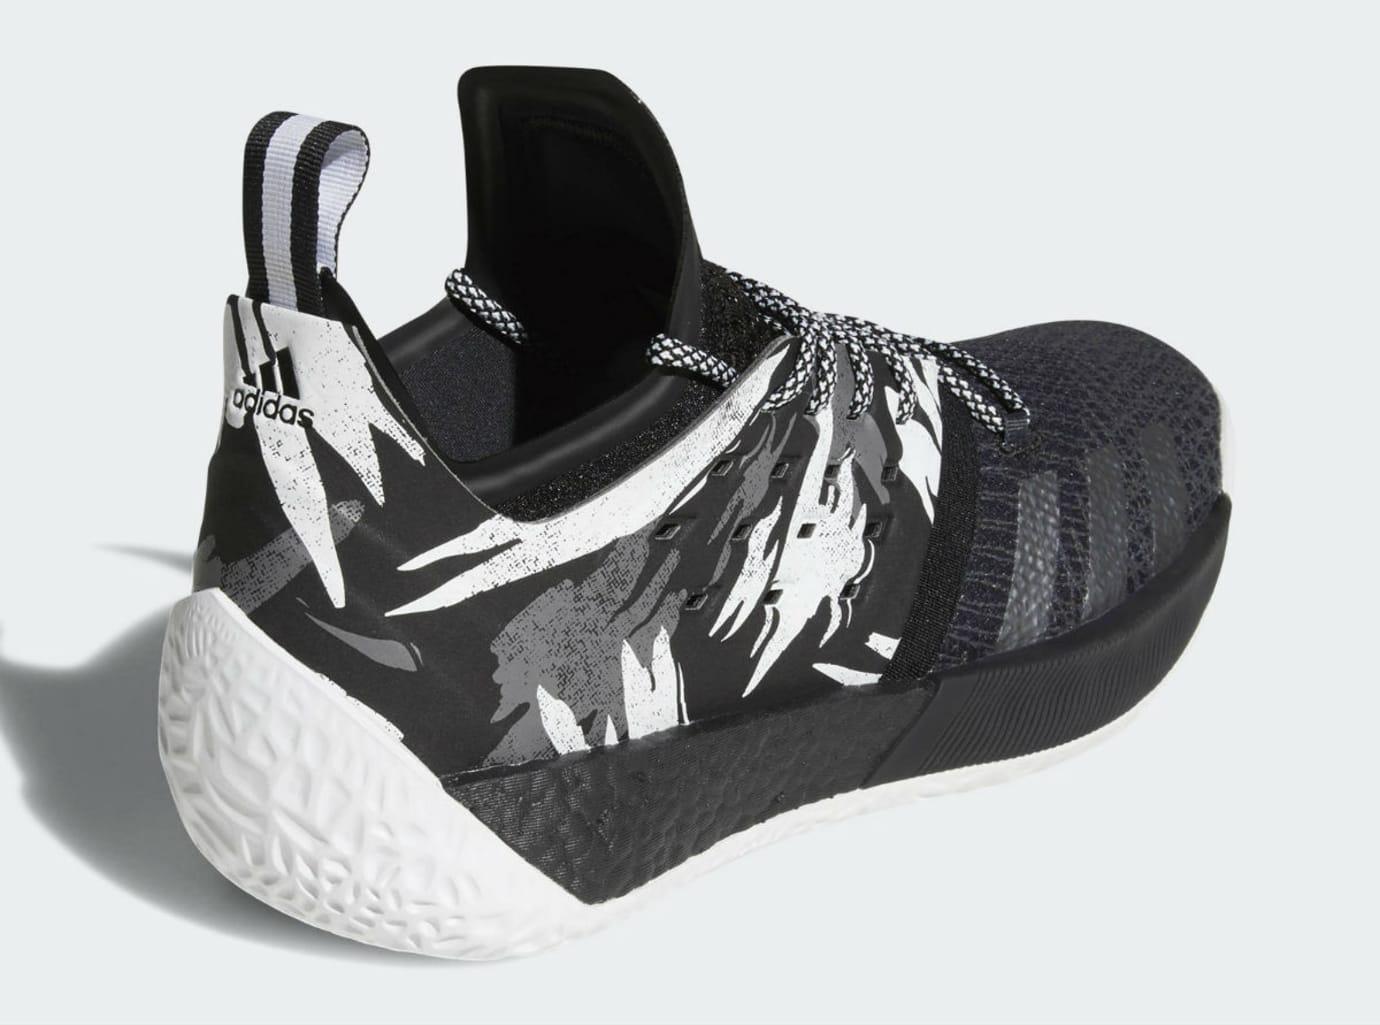 Adidas Harden Vol. 2 Traffic Jam Release Date AH2217 Back